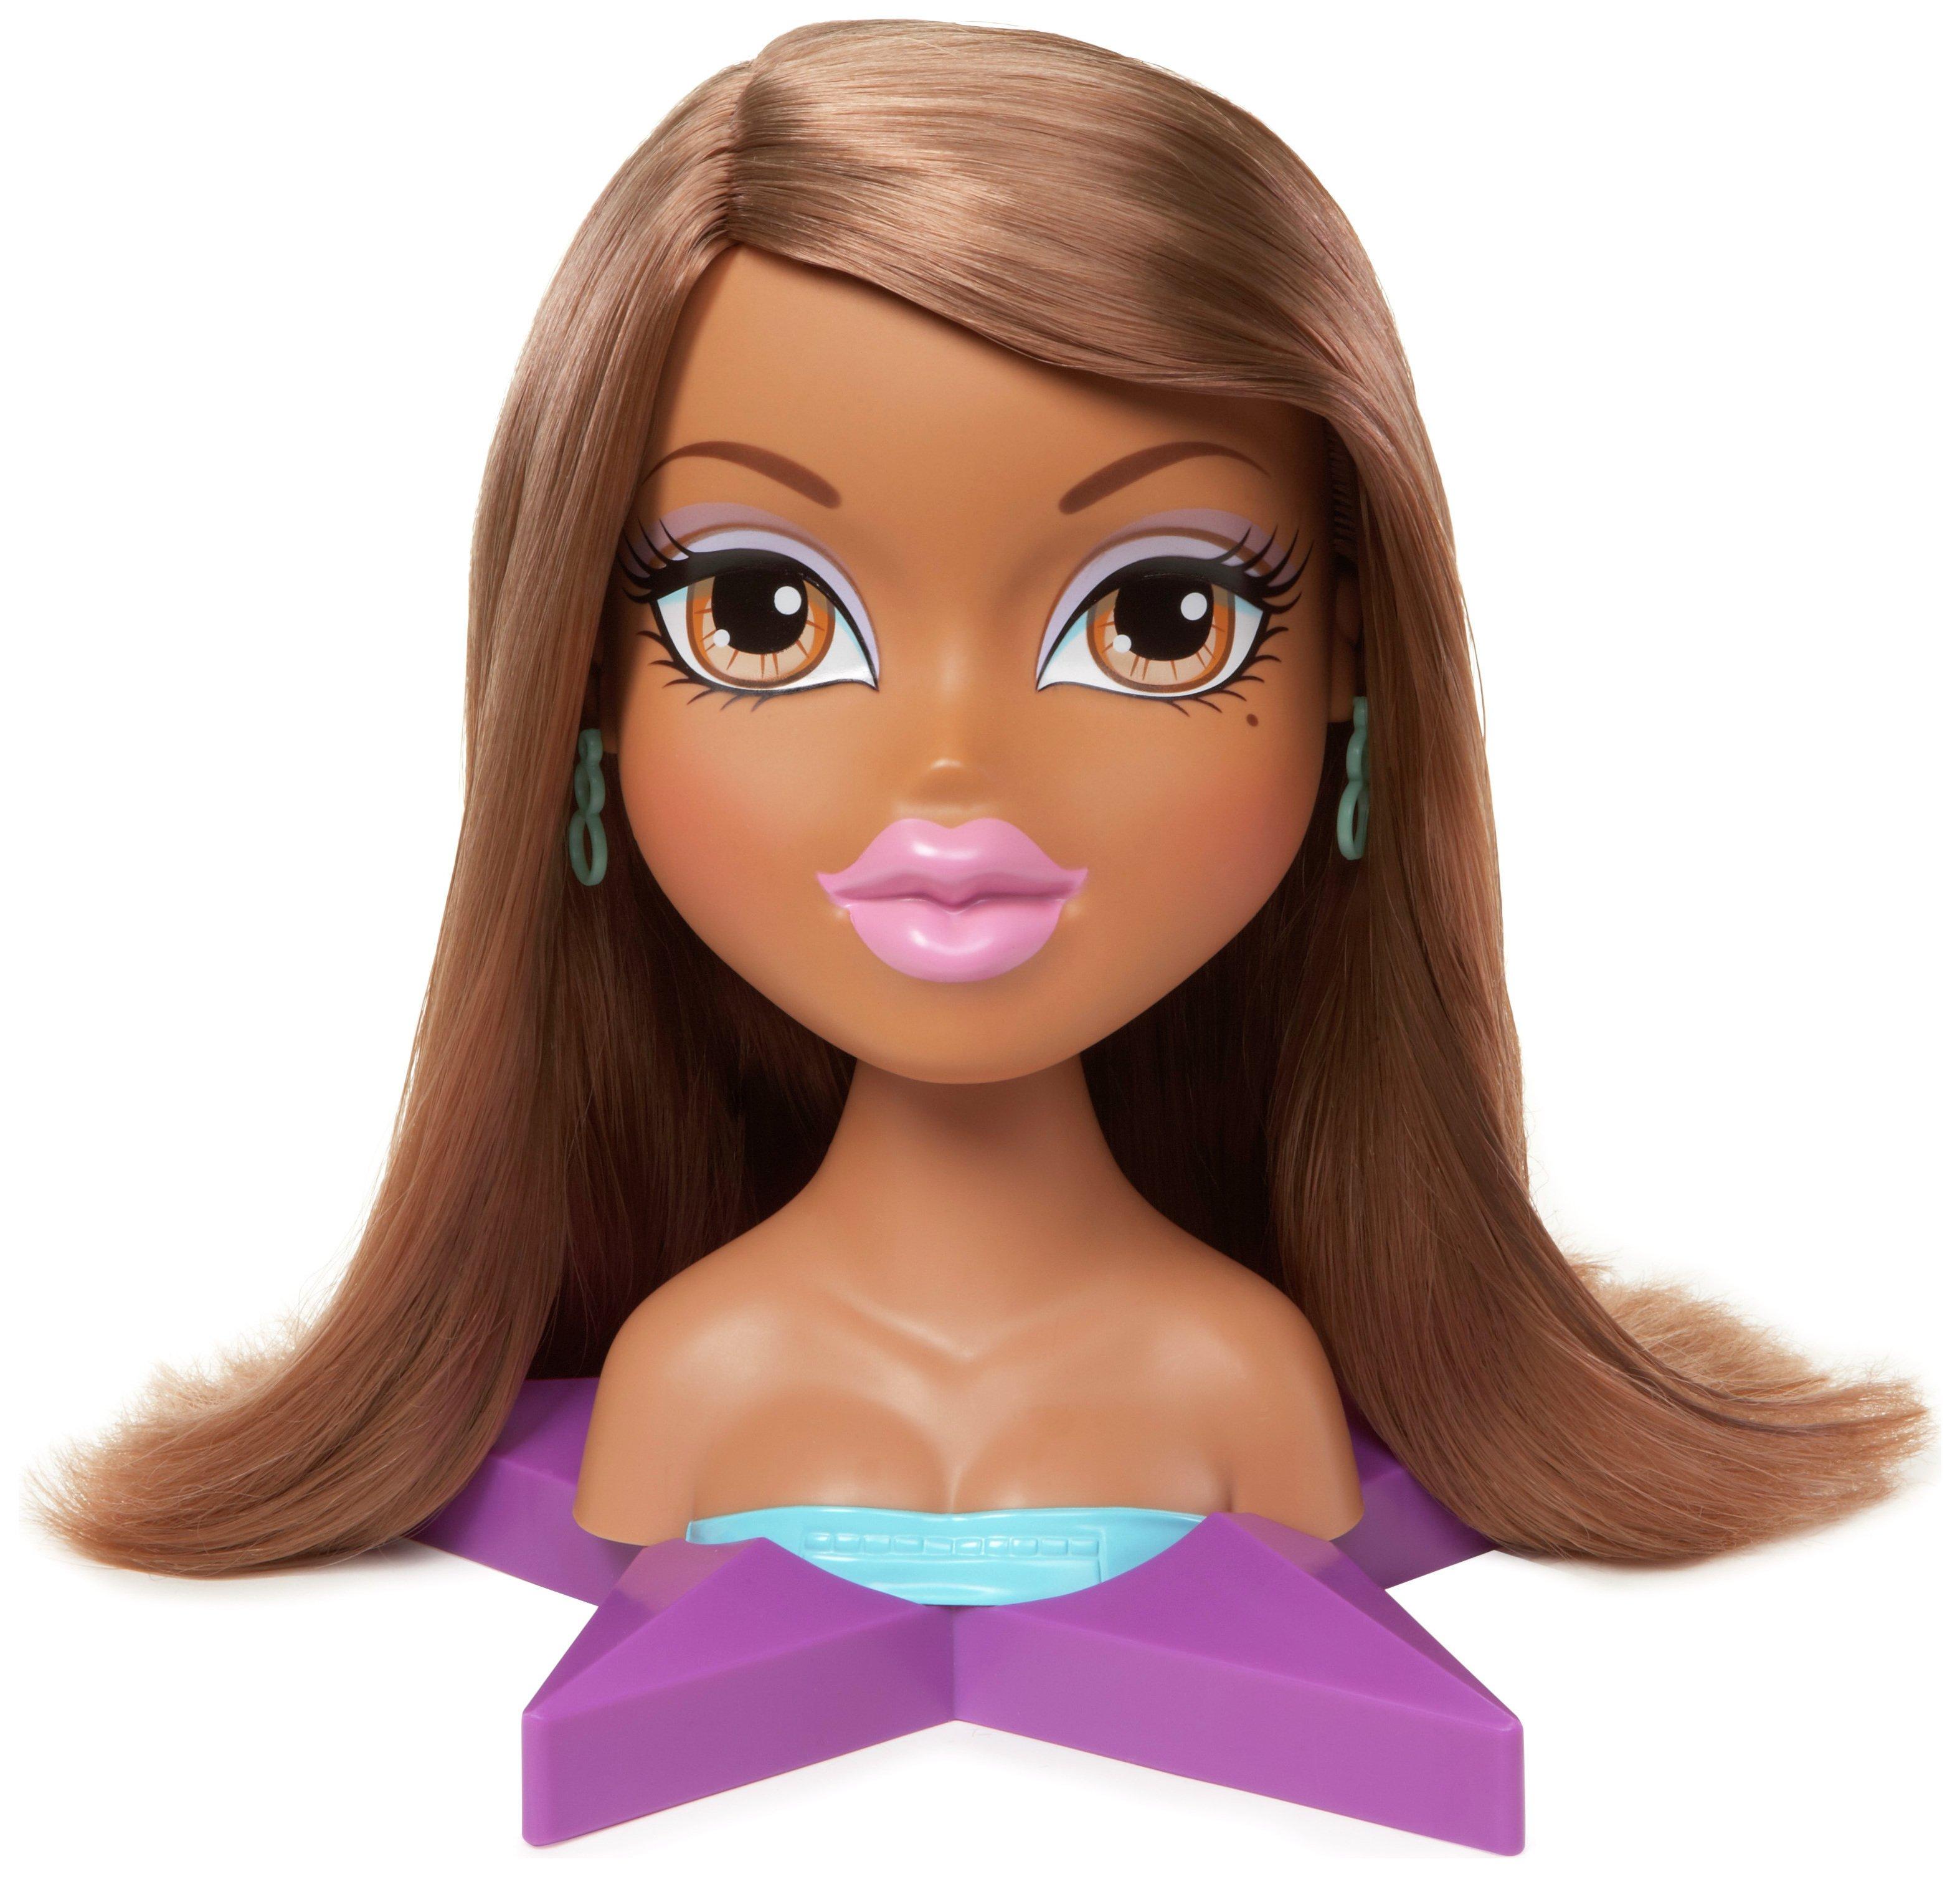 Image of Bratz Styling Head Doll - Yasmin.